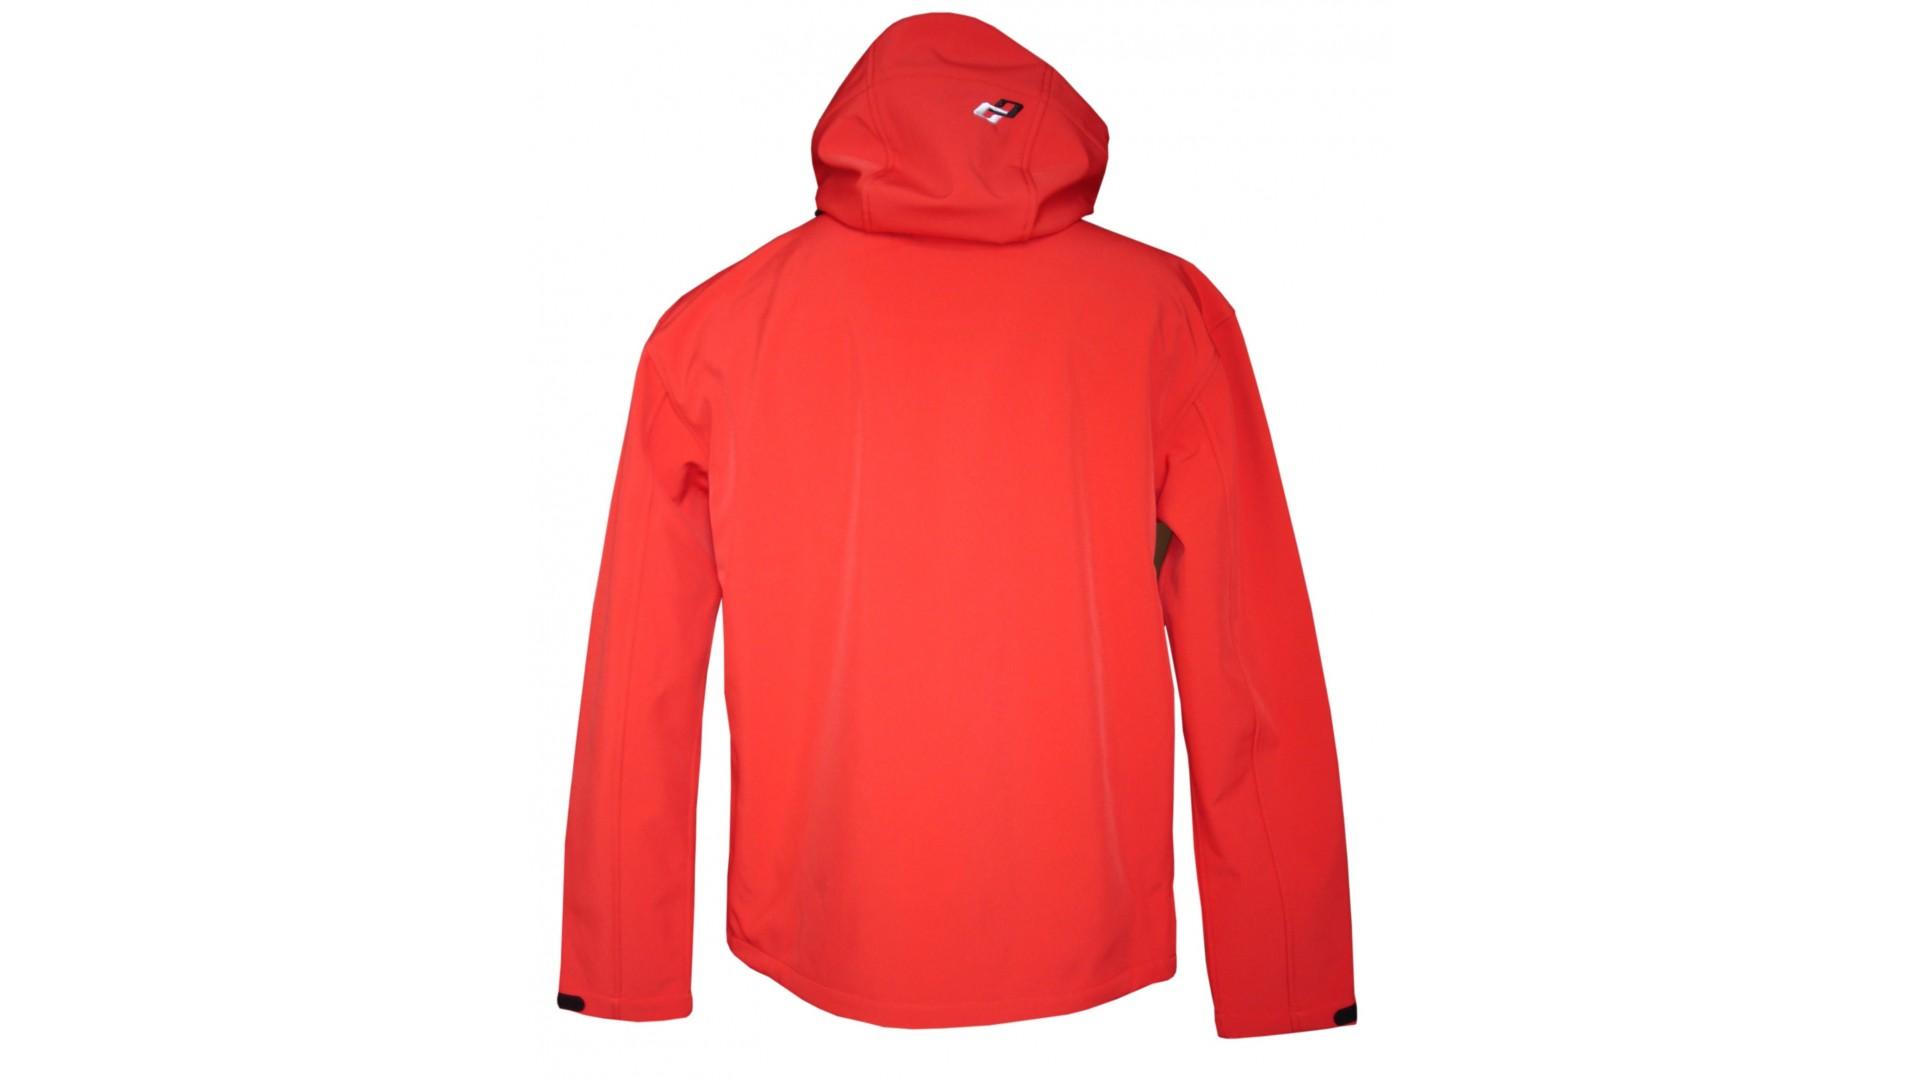 Велокуртка Ghost с капюшоном мужская red/black год 2014